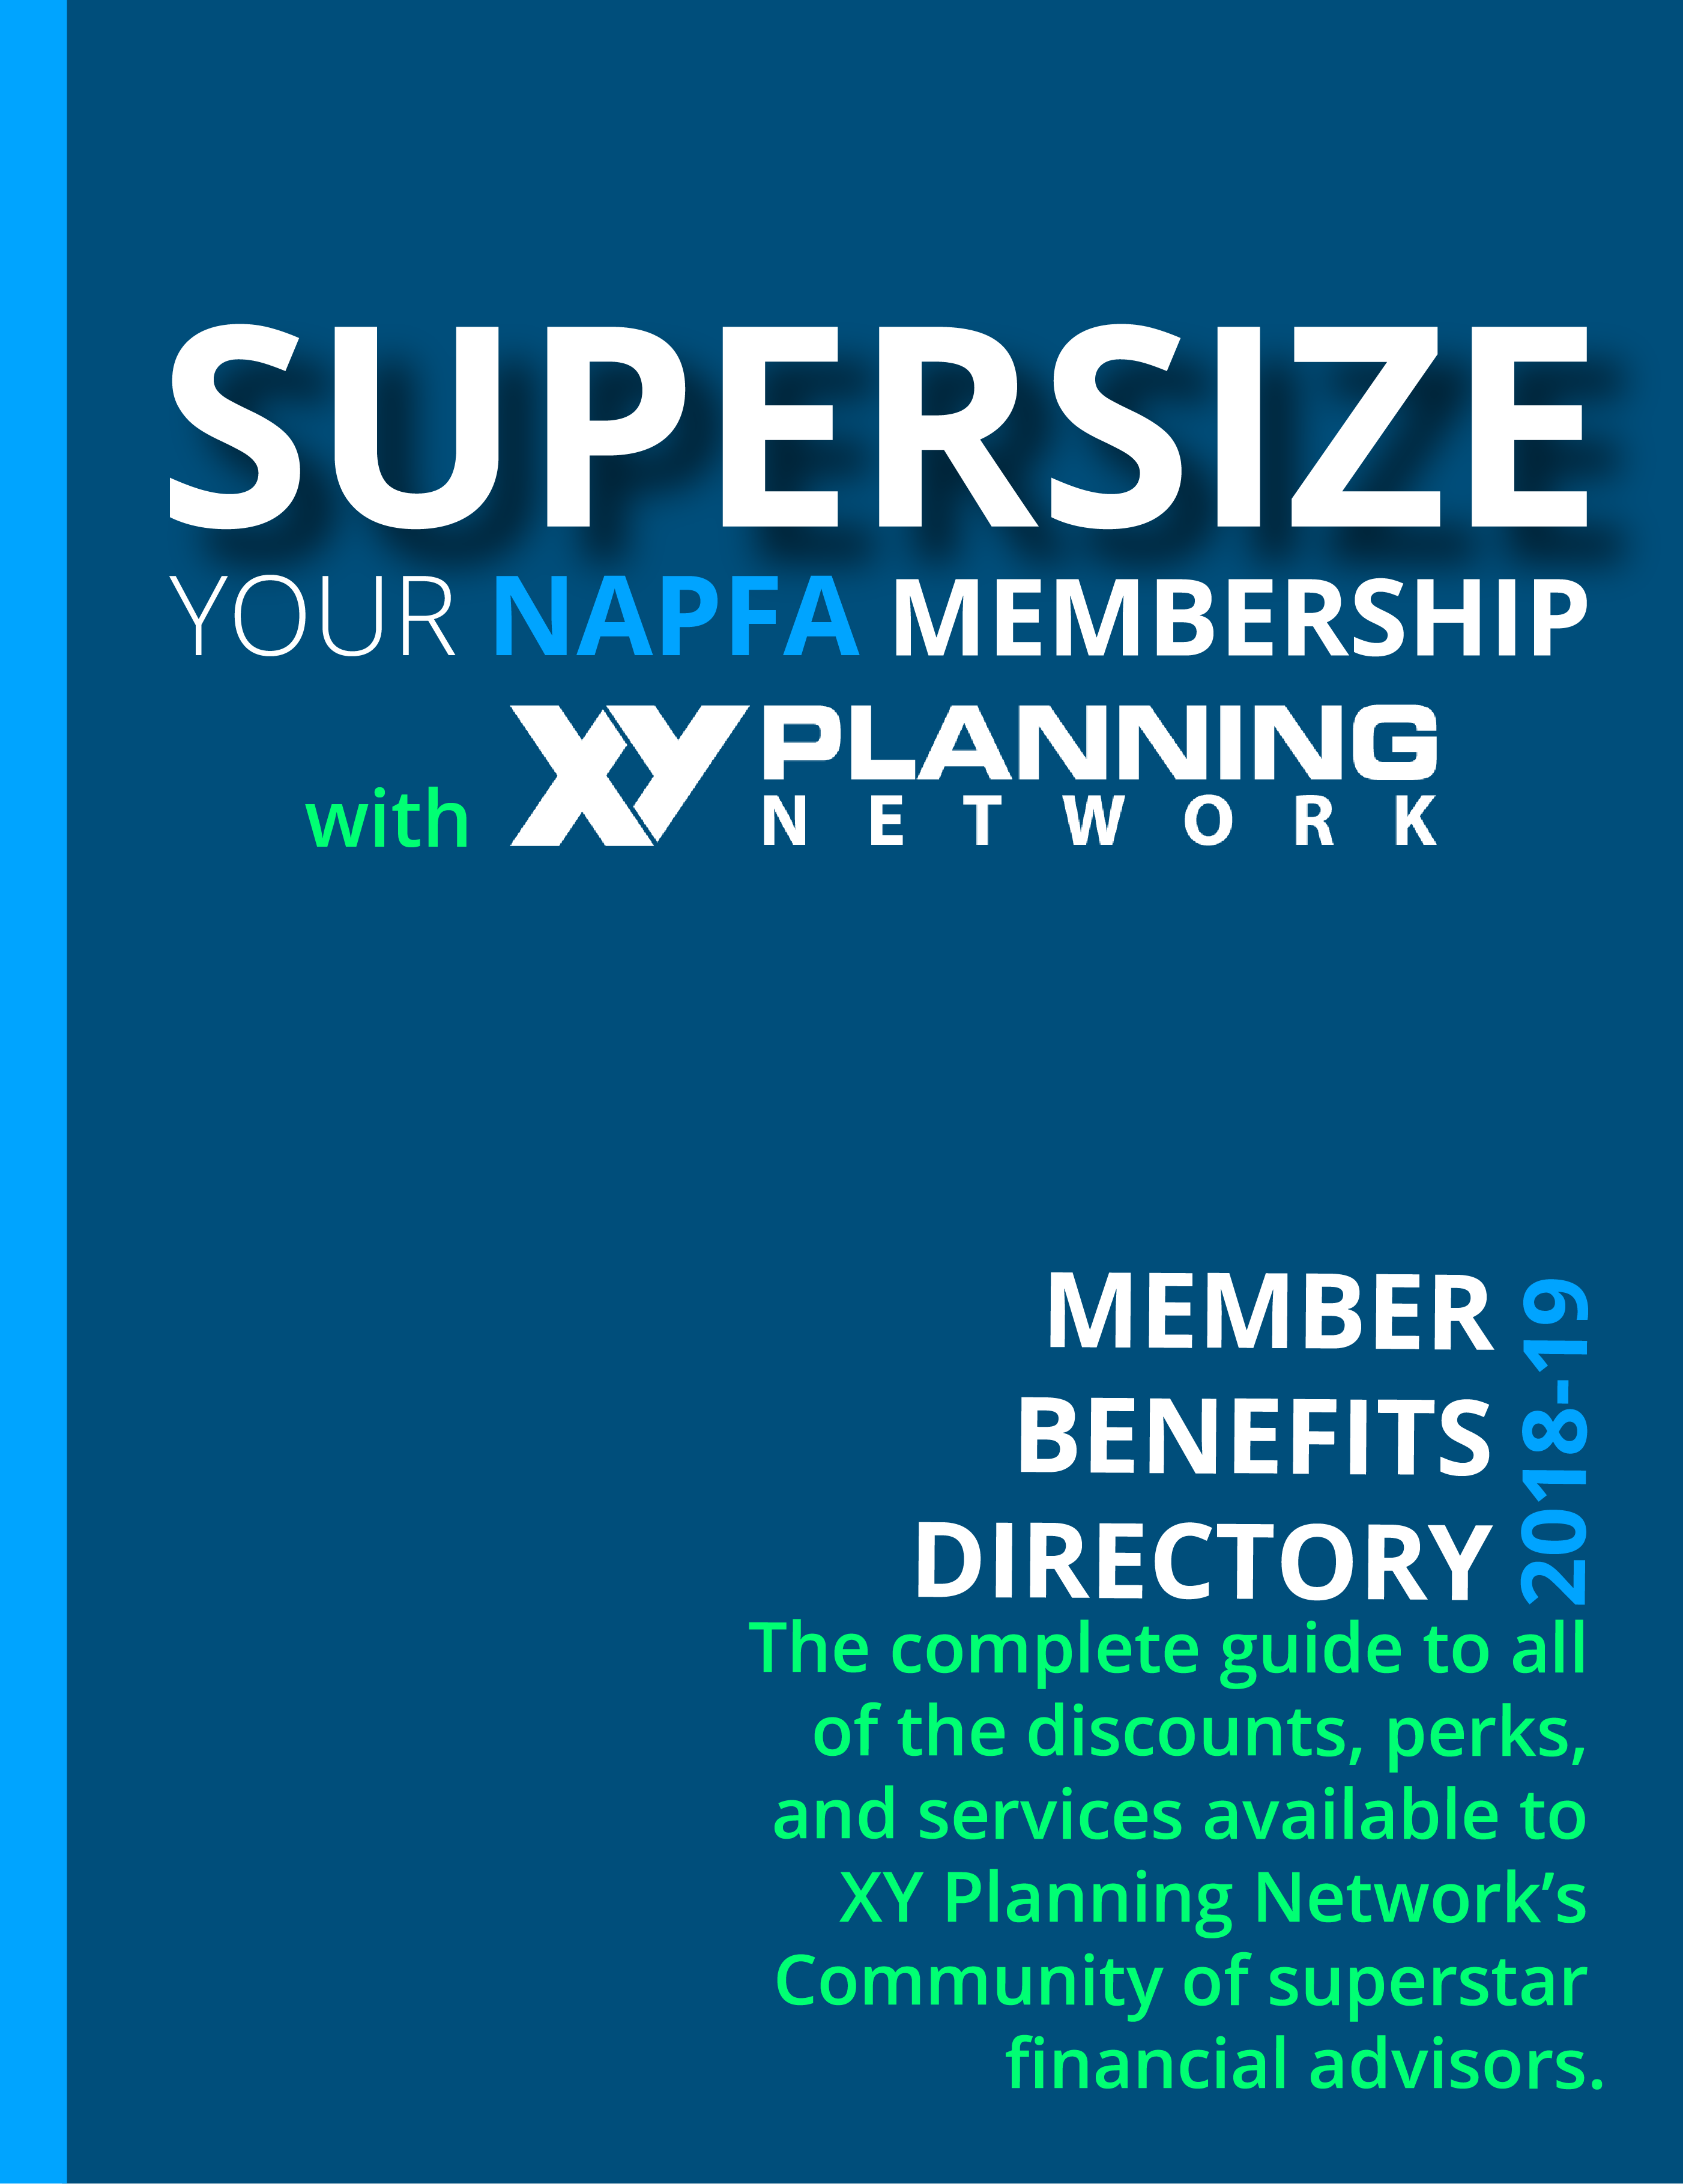 Supersize Your NAPFA Membership Cover